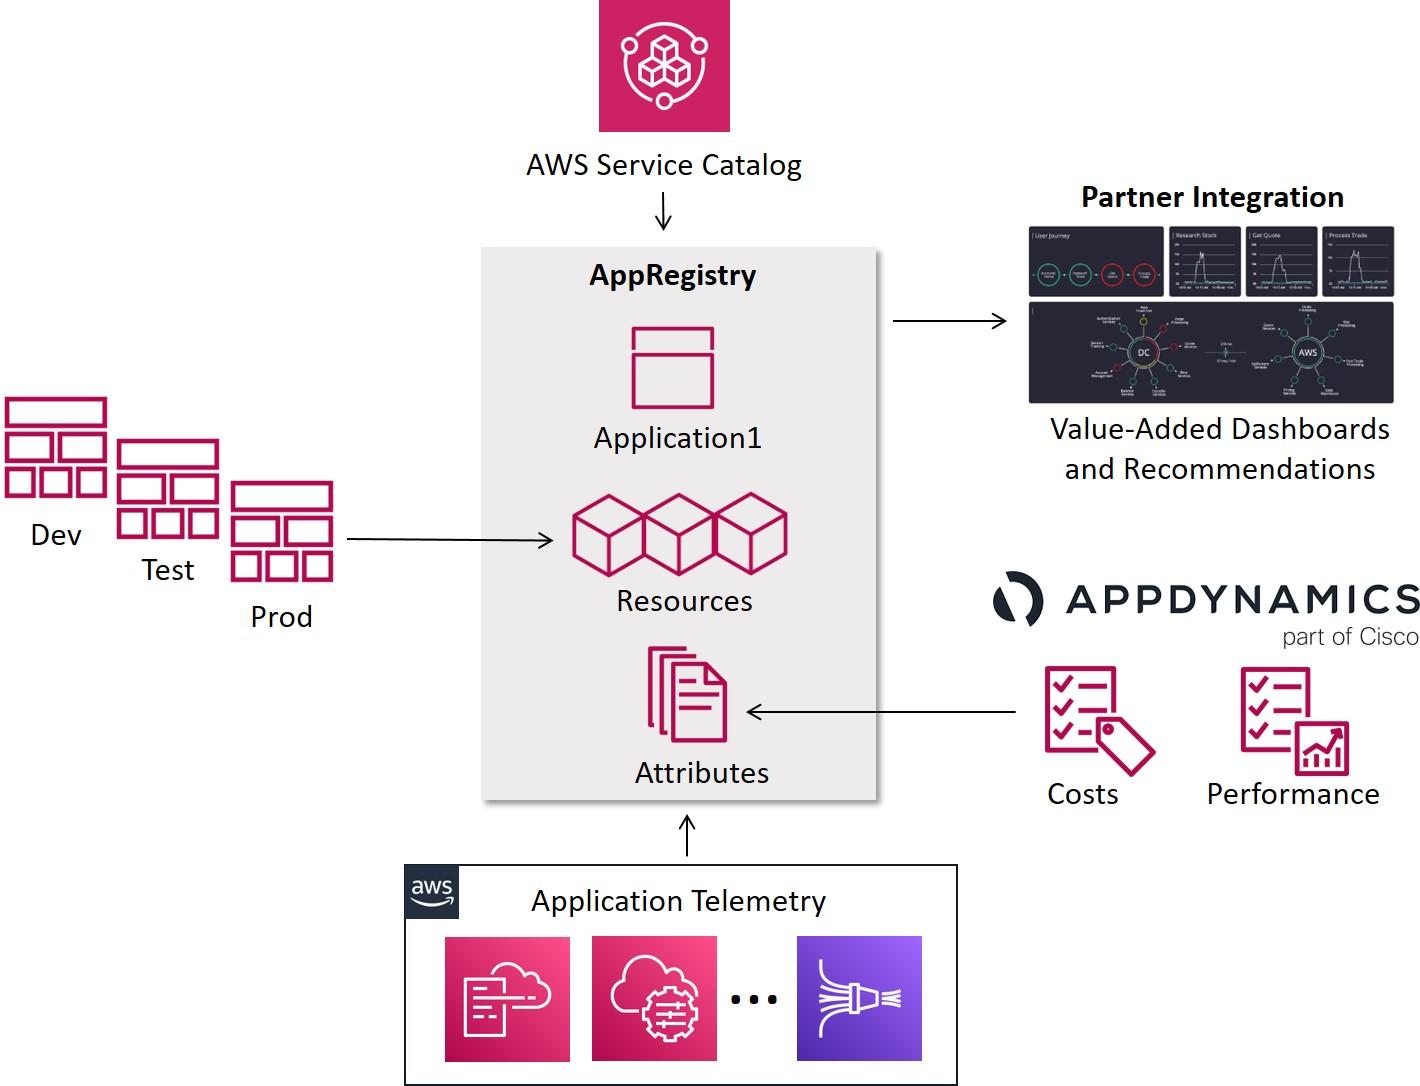 Diagram displays integration between AppDynamics, AppRegistry, AWS Service Catalog, application telemetry, partner integration, and dev, test, and prod environments.